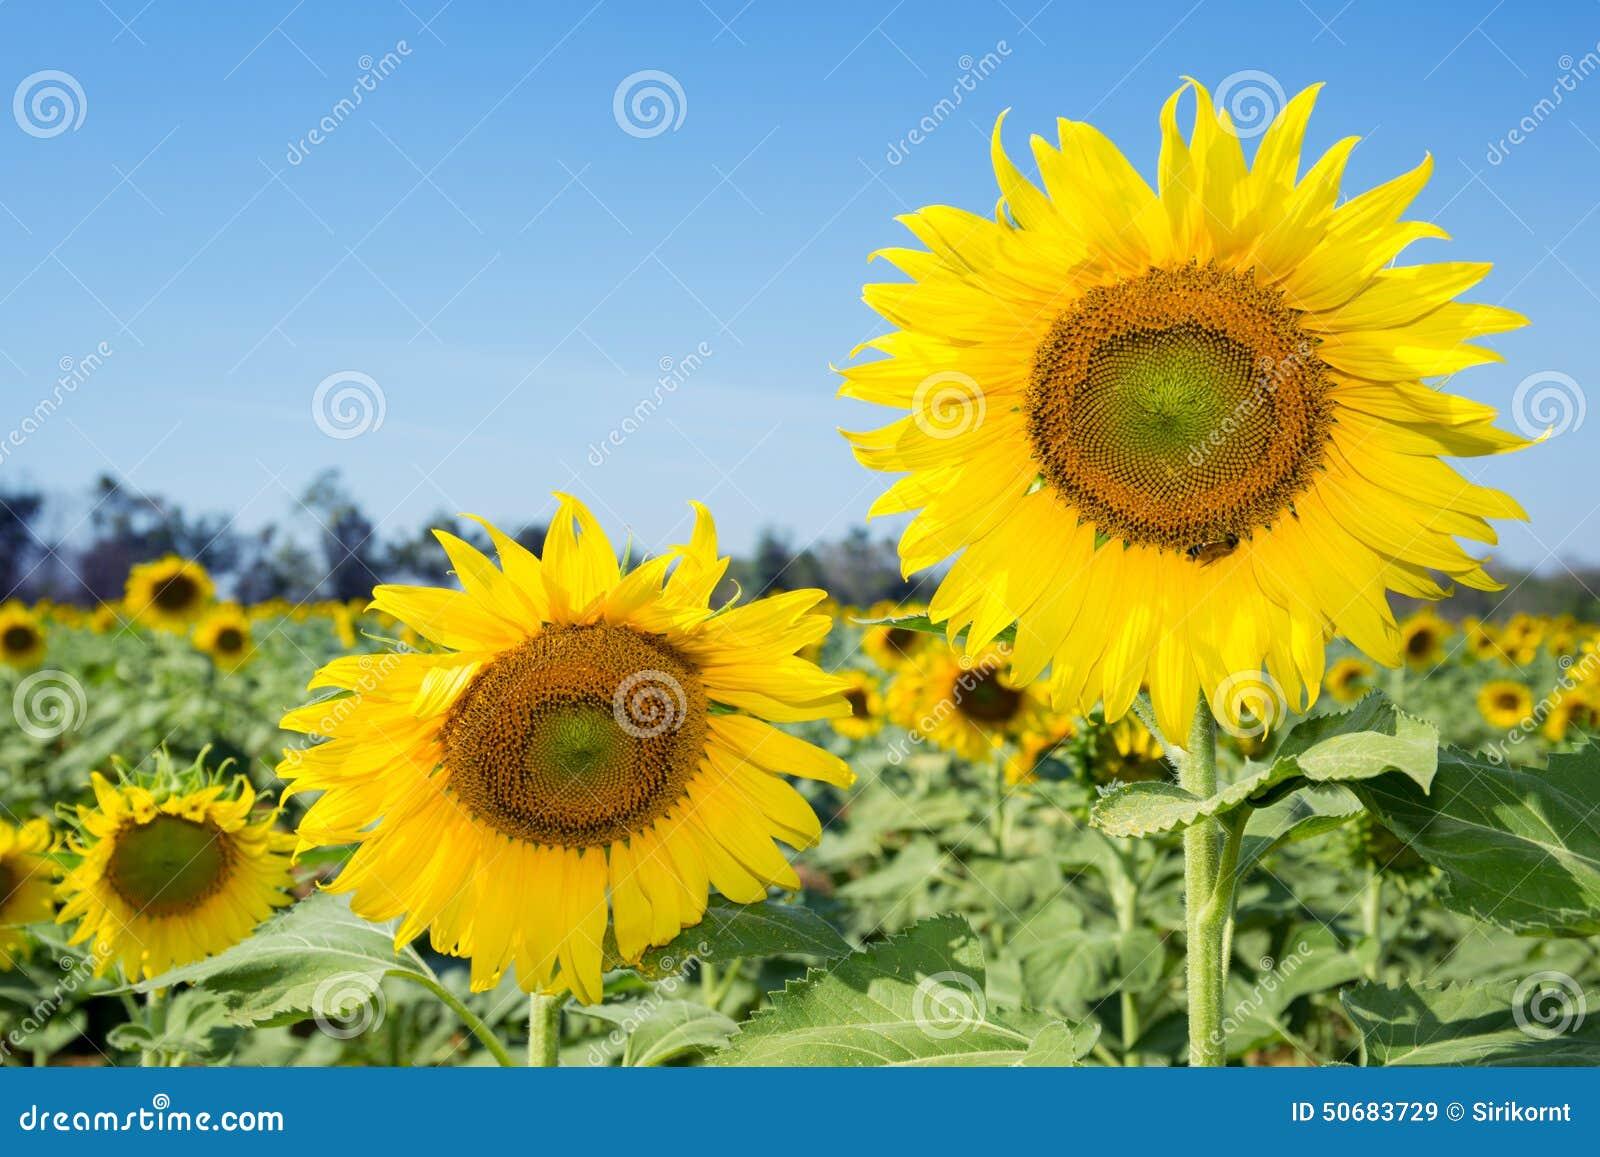 Download 明亮的花黄色 库存图片. 图片 包括有 花束, 黄色, 问候, 春天, 看板卡, 背包, 庭院, 本质, 植物群 - 50683729